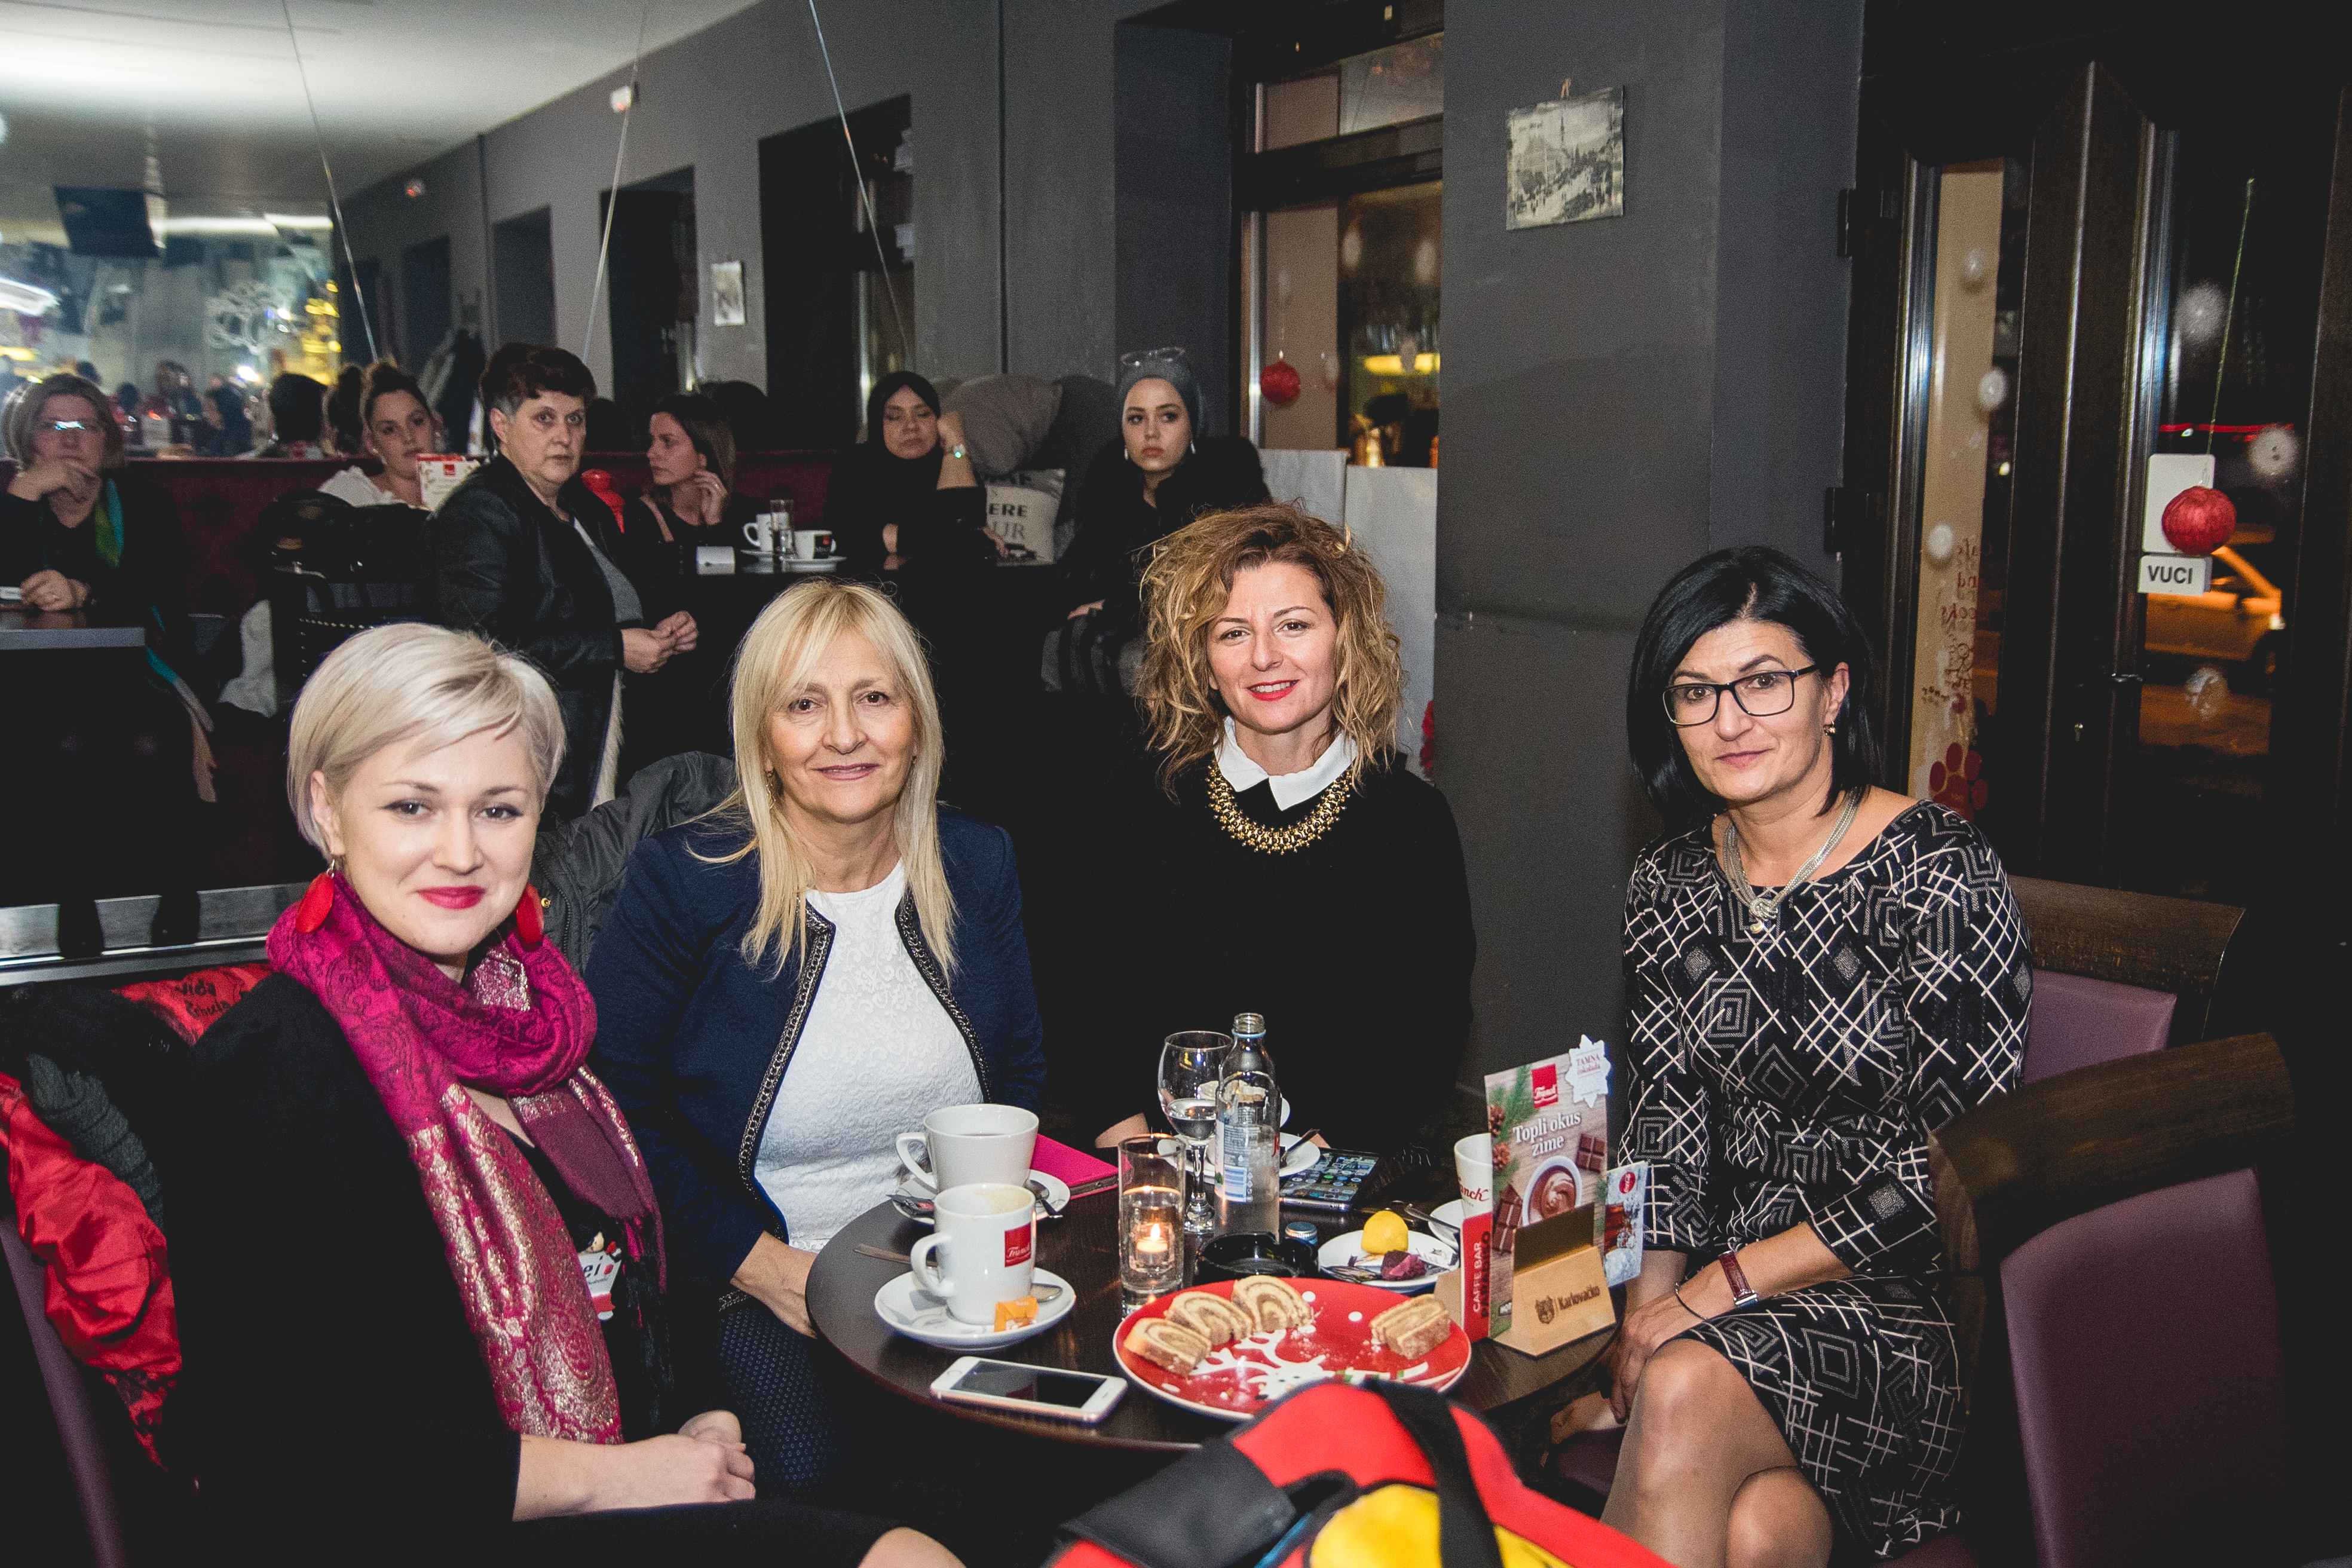 likaclub_paradiso_predstavljanje-knjige_2018-8